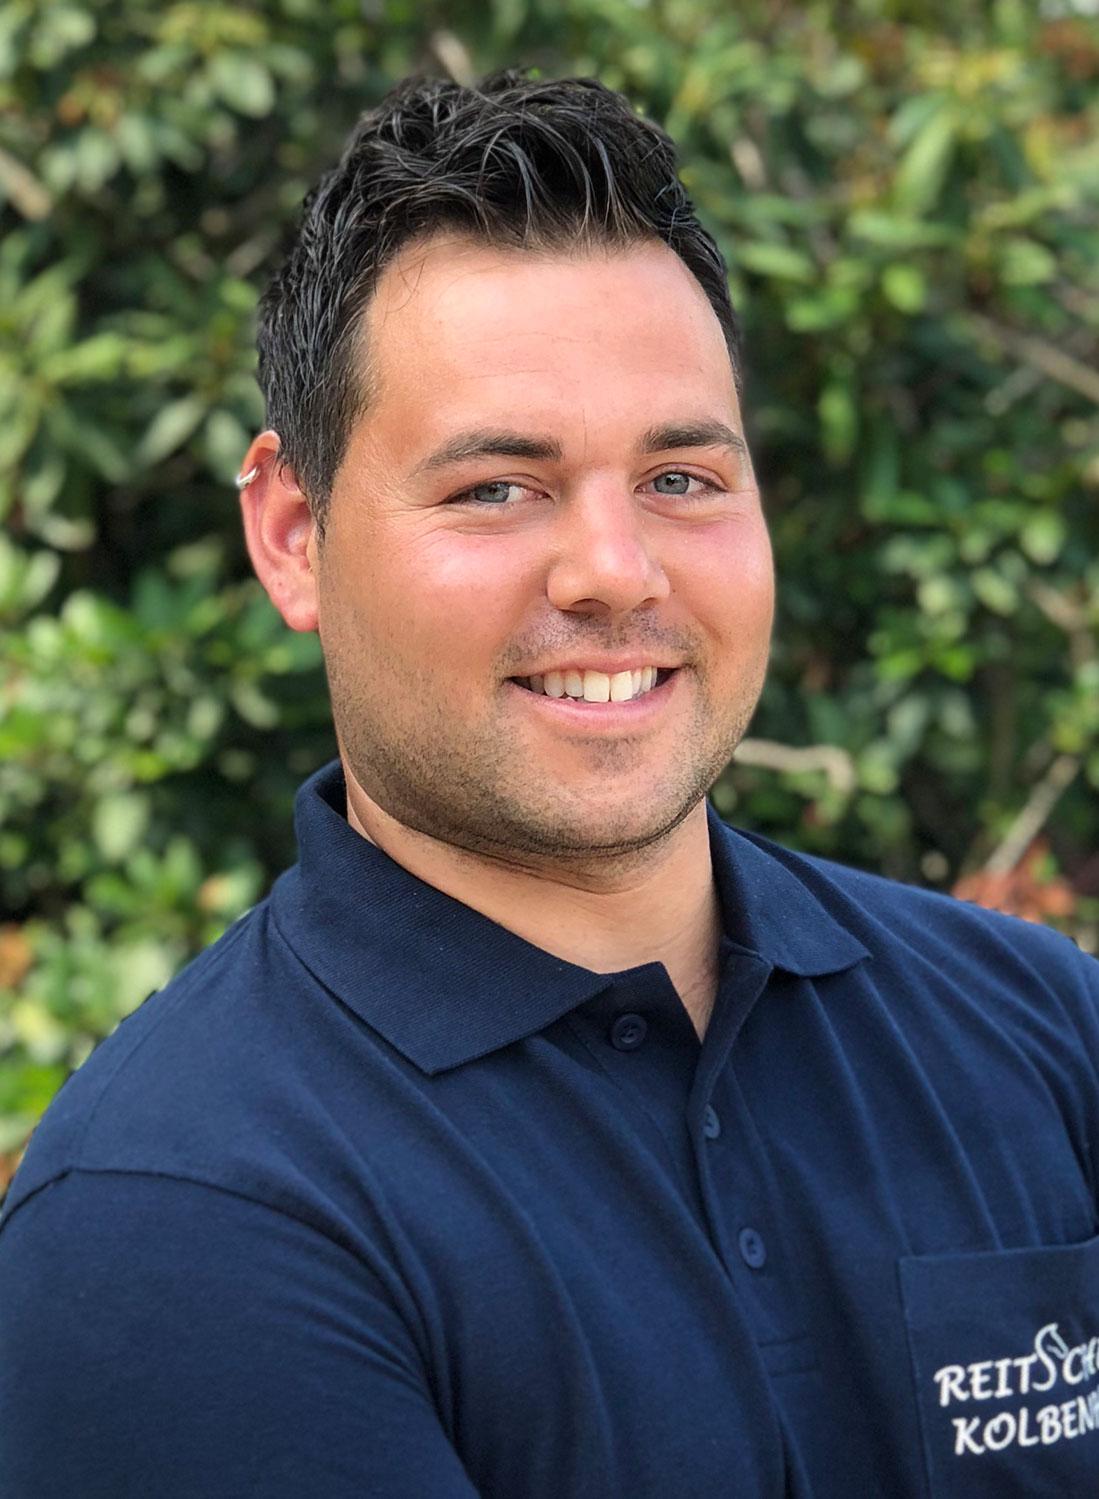 Patrick Manser